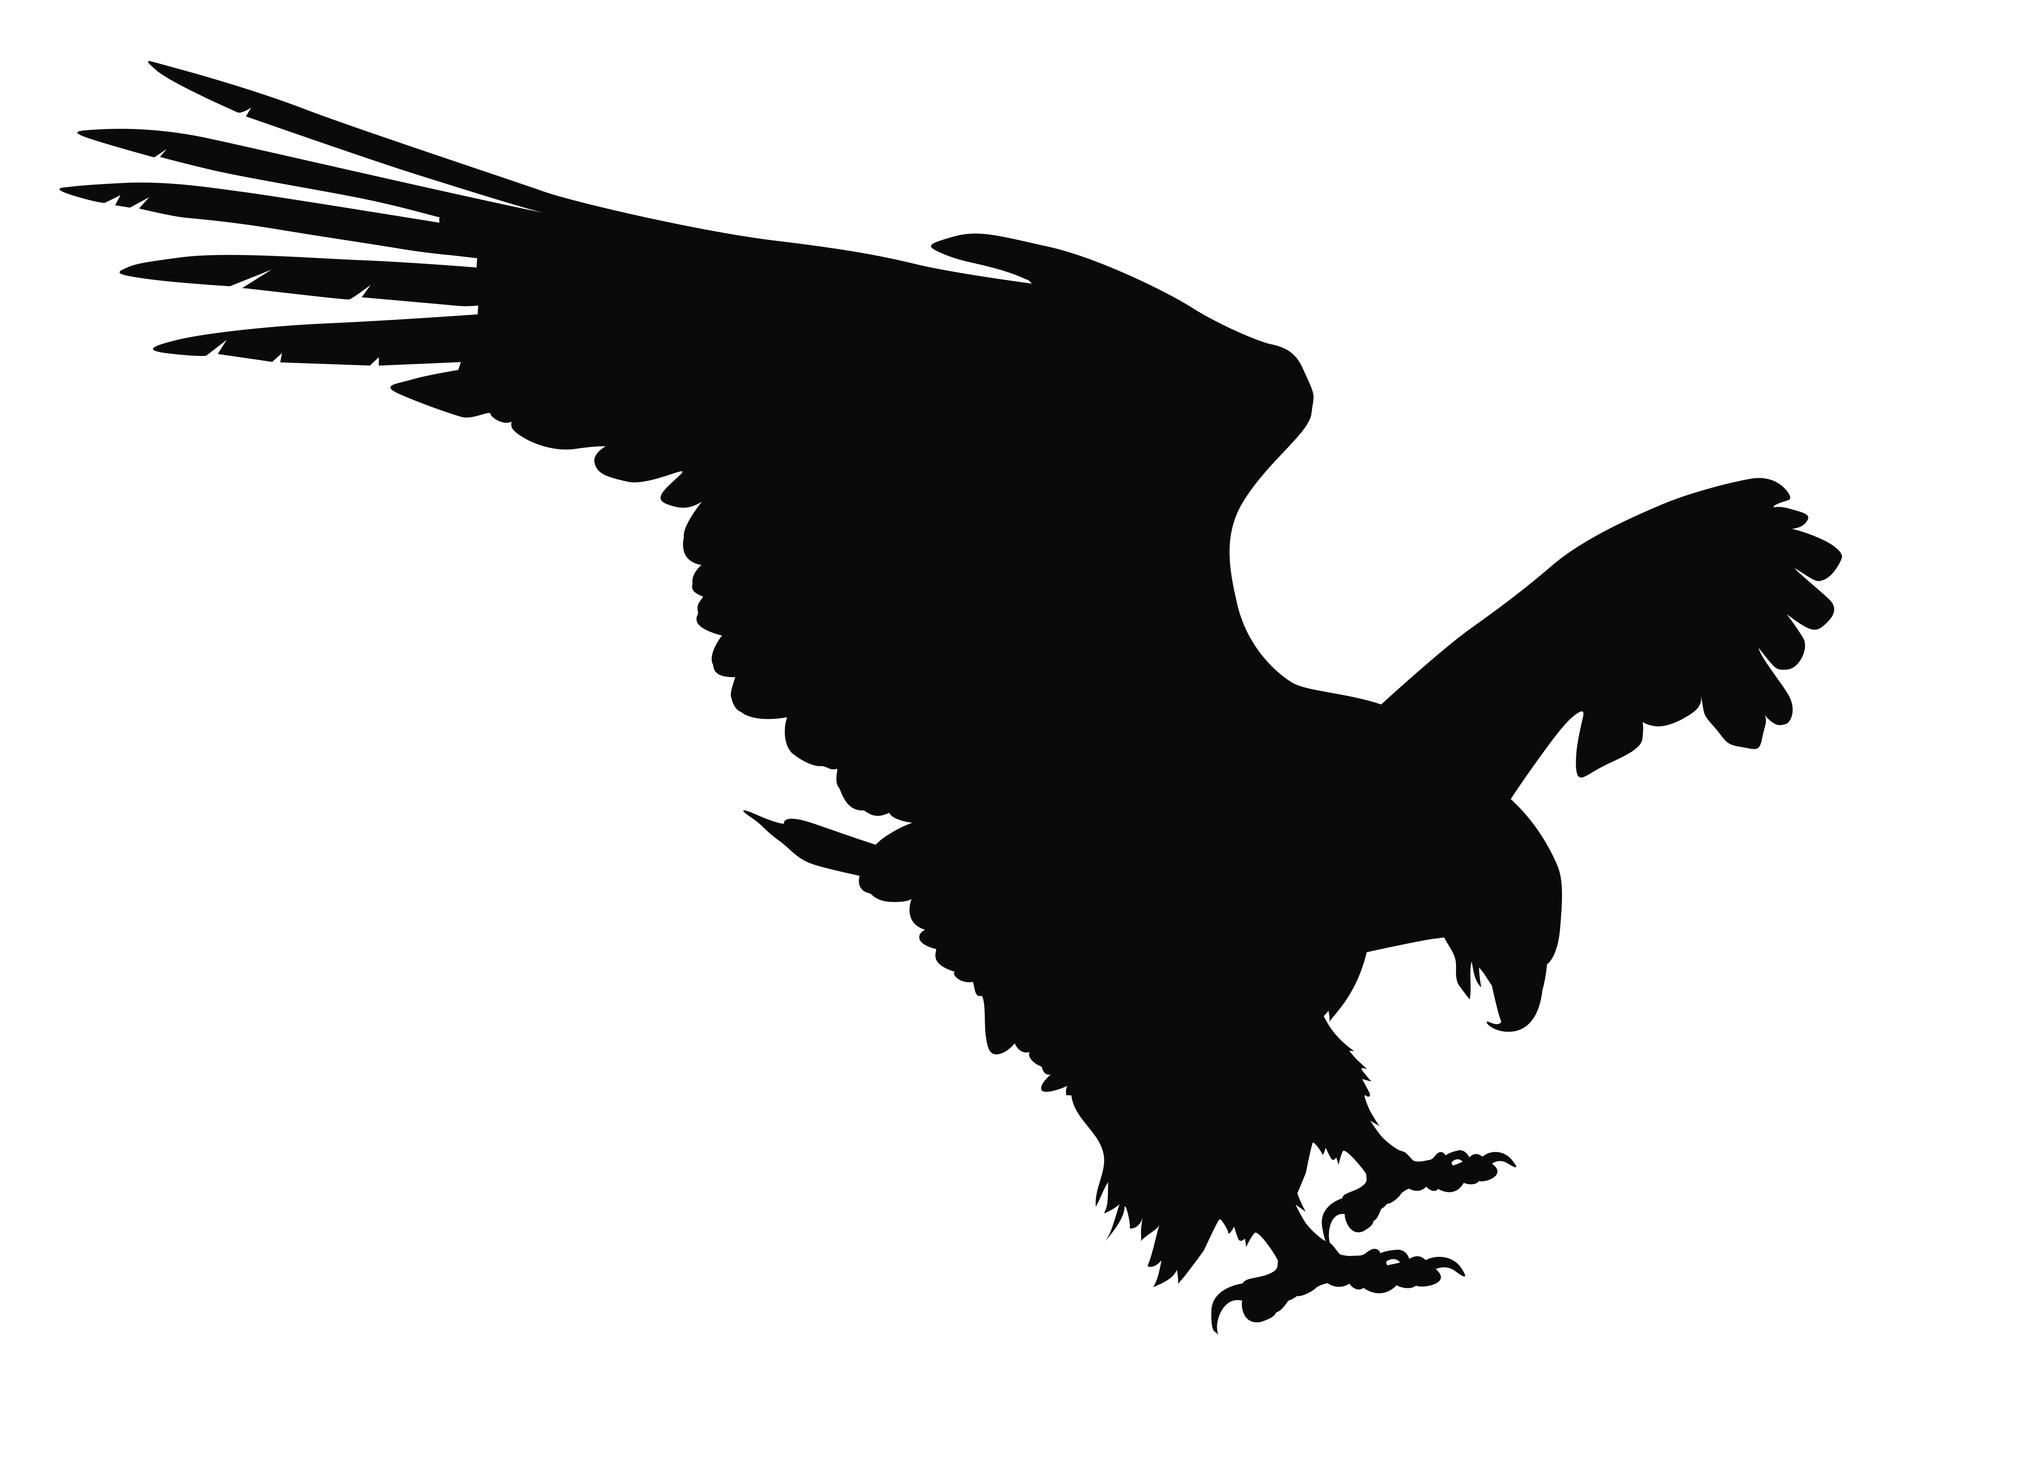 bird abatement sonoran desert falconry